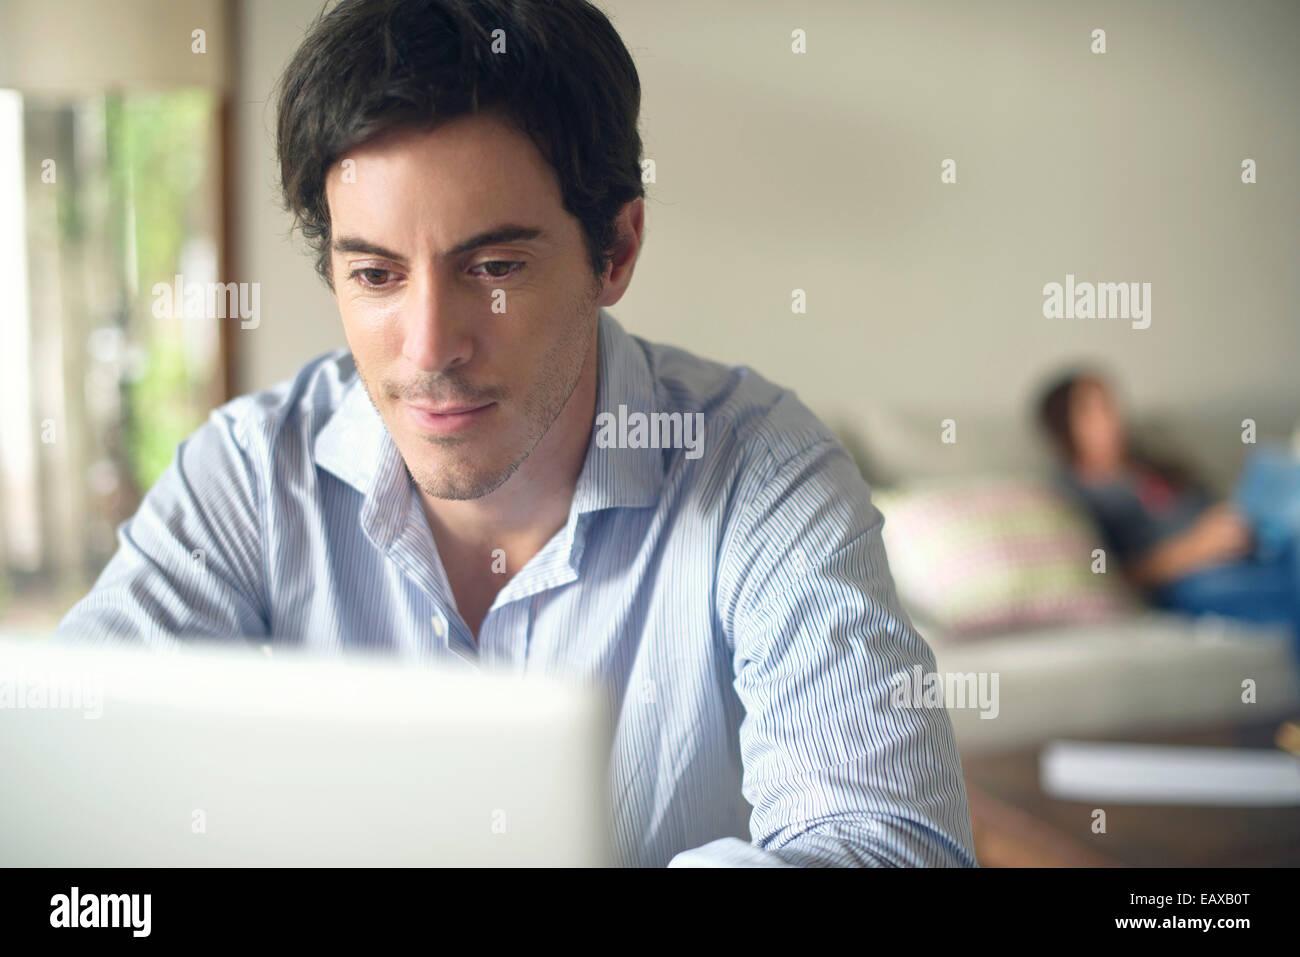 Man using laptop computer Photo Stock